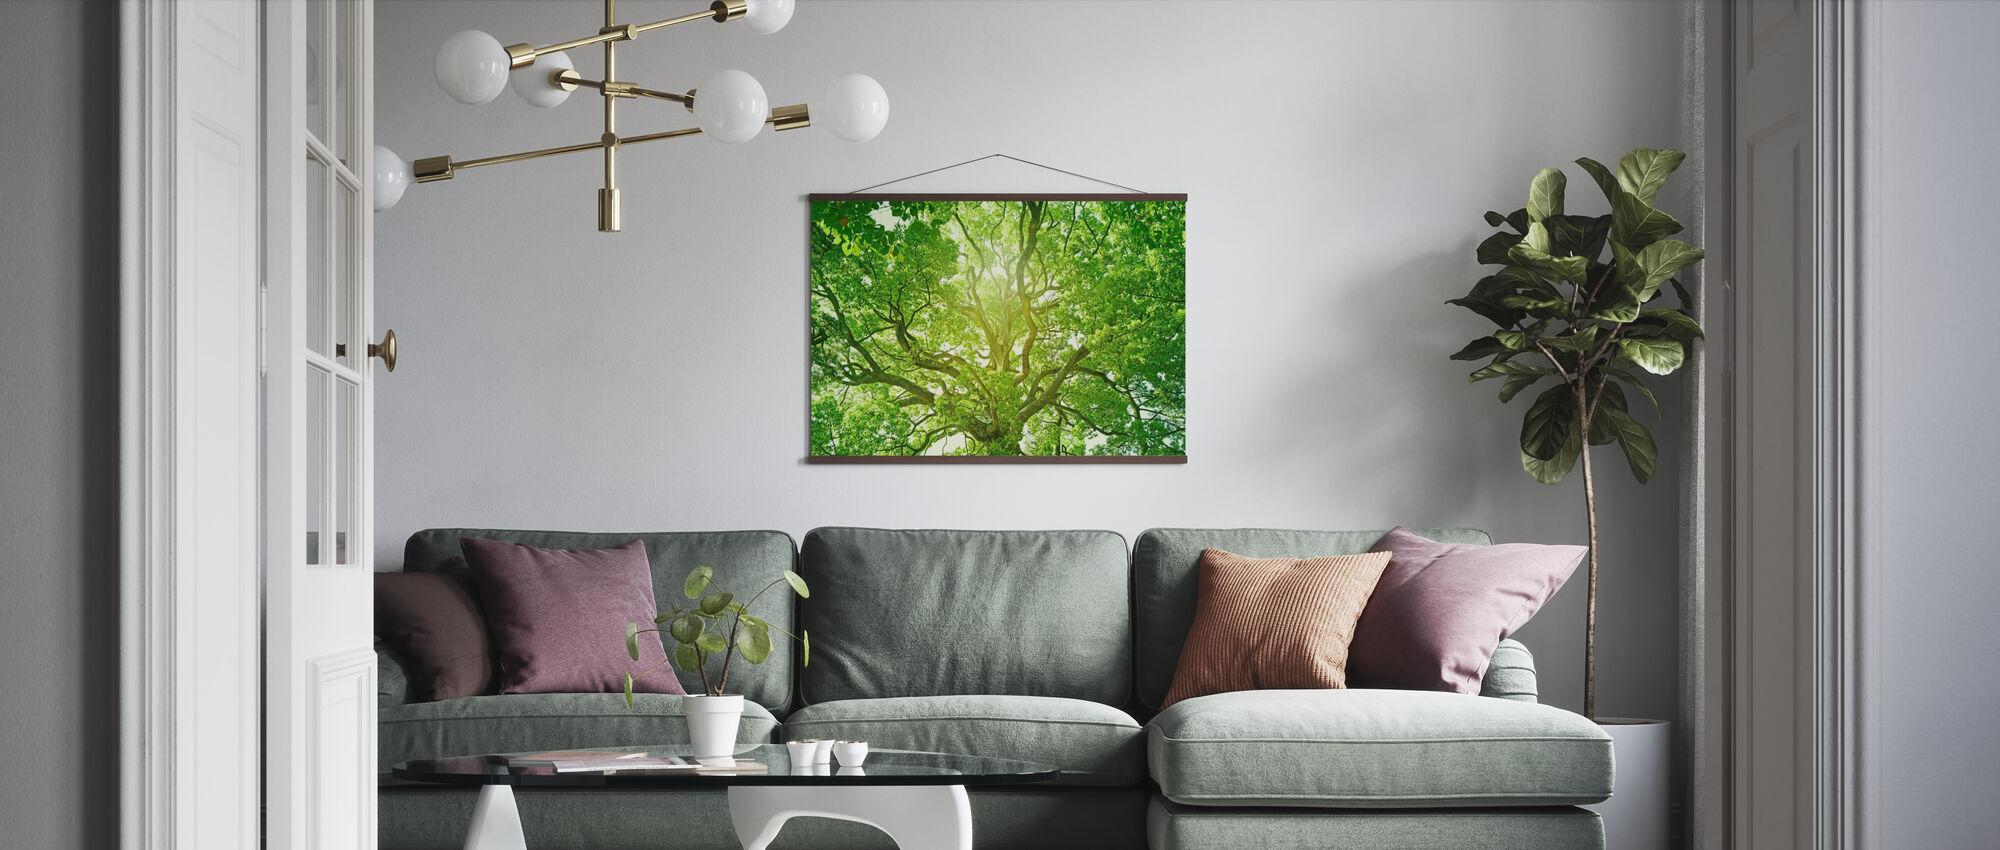 Fersk grønt tre - Plakat - Stue